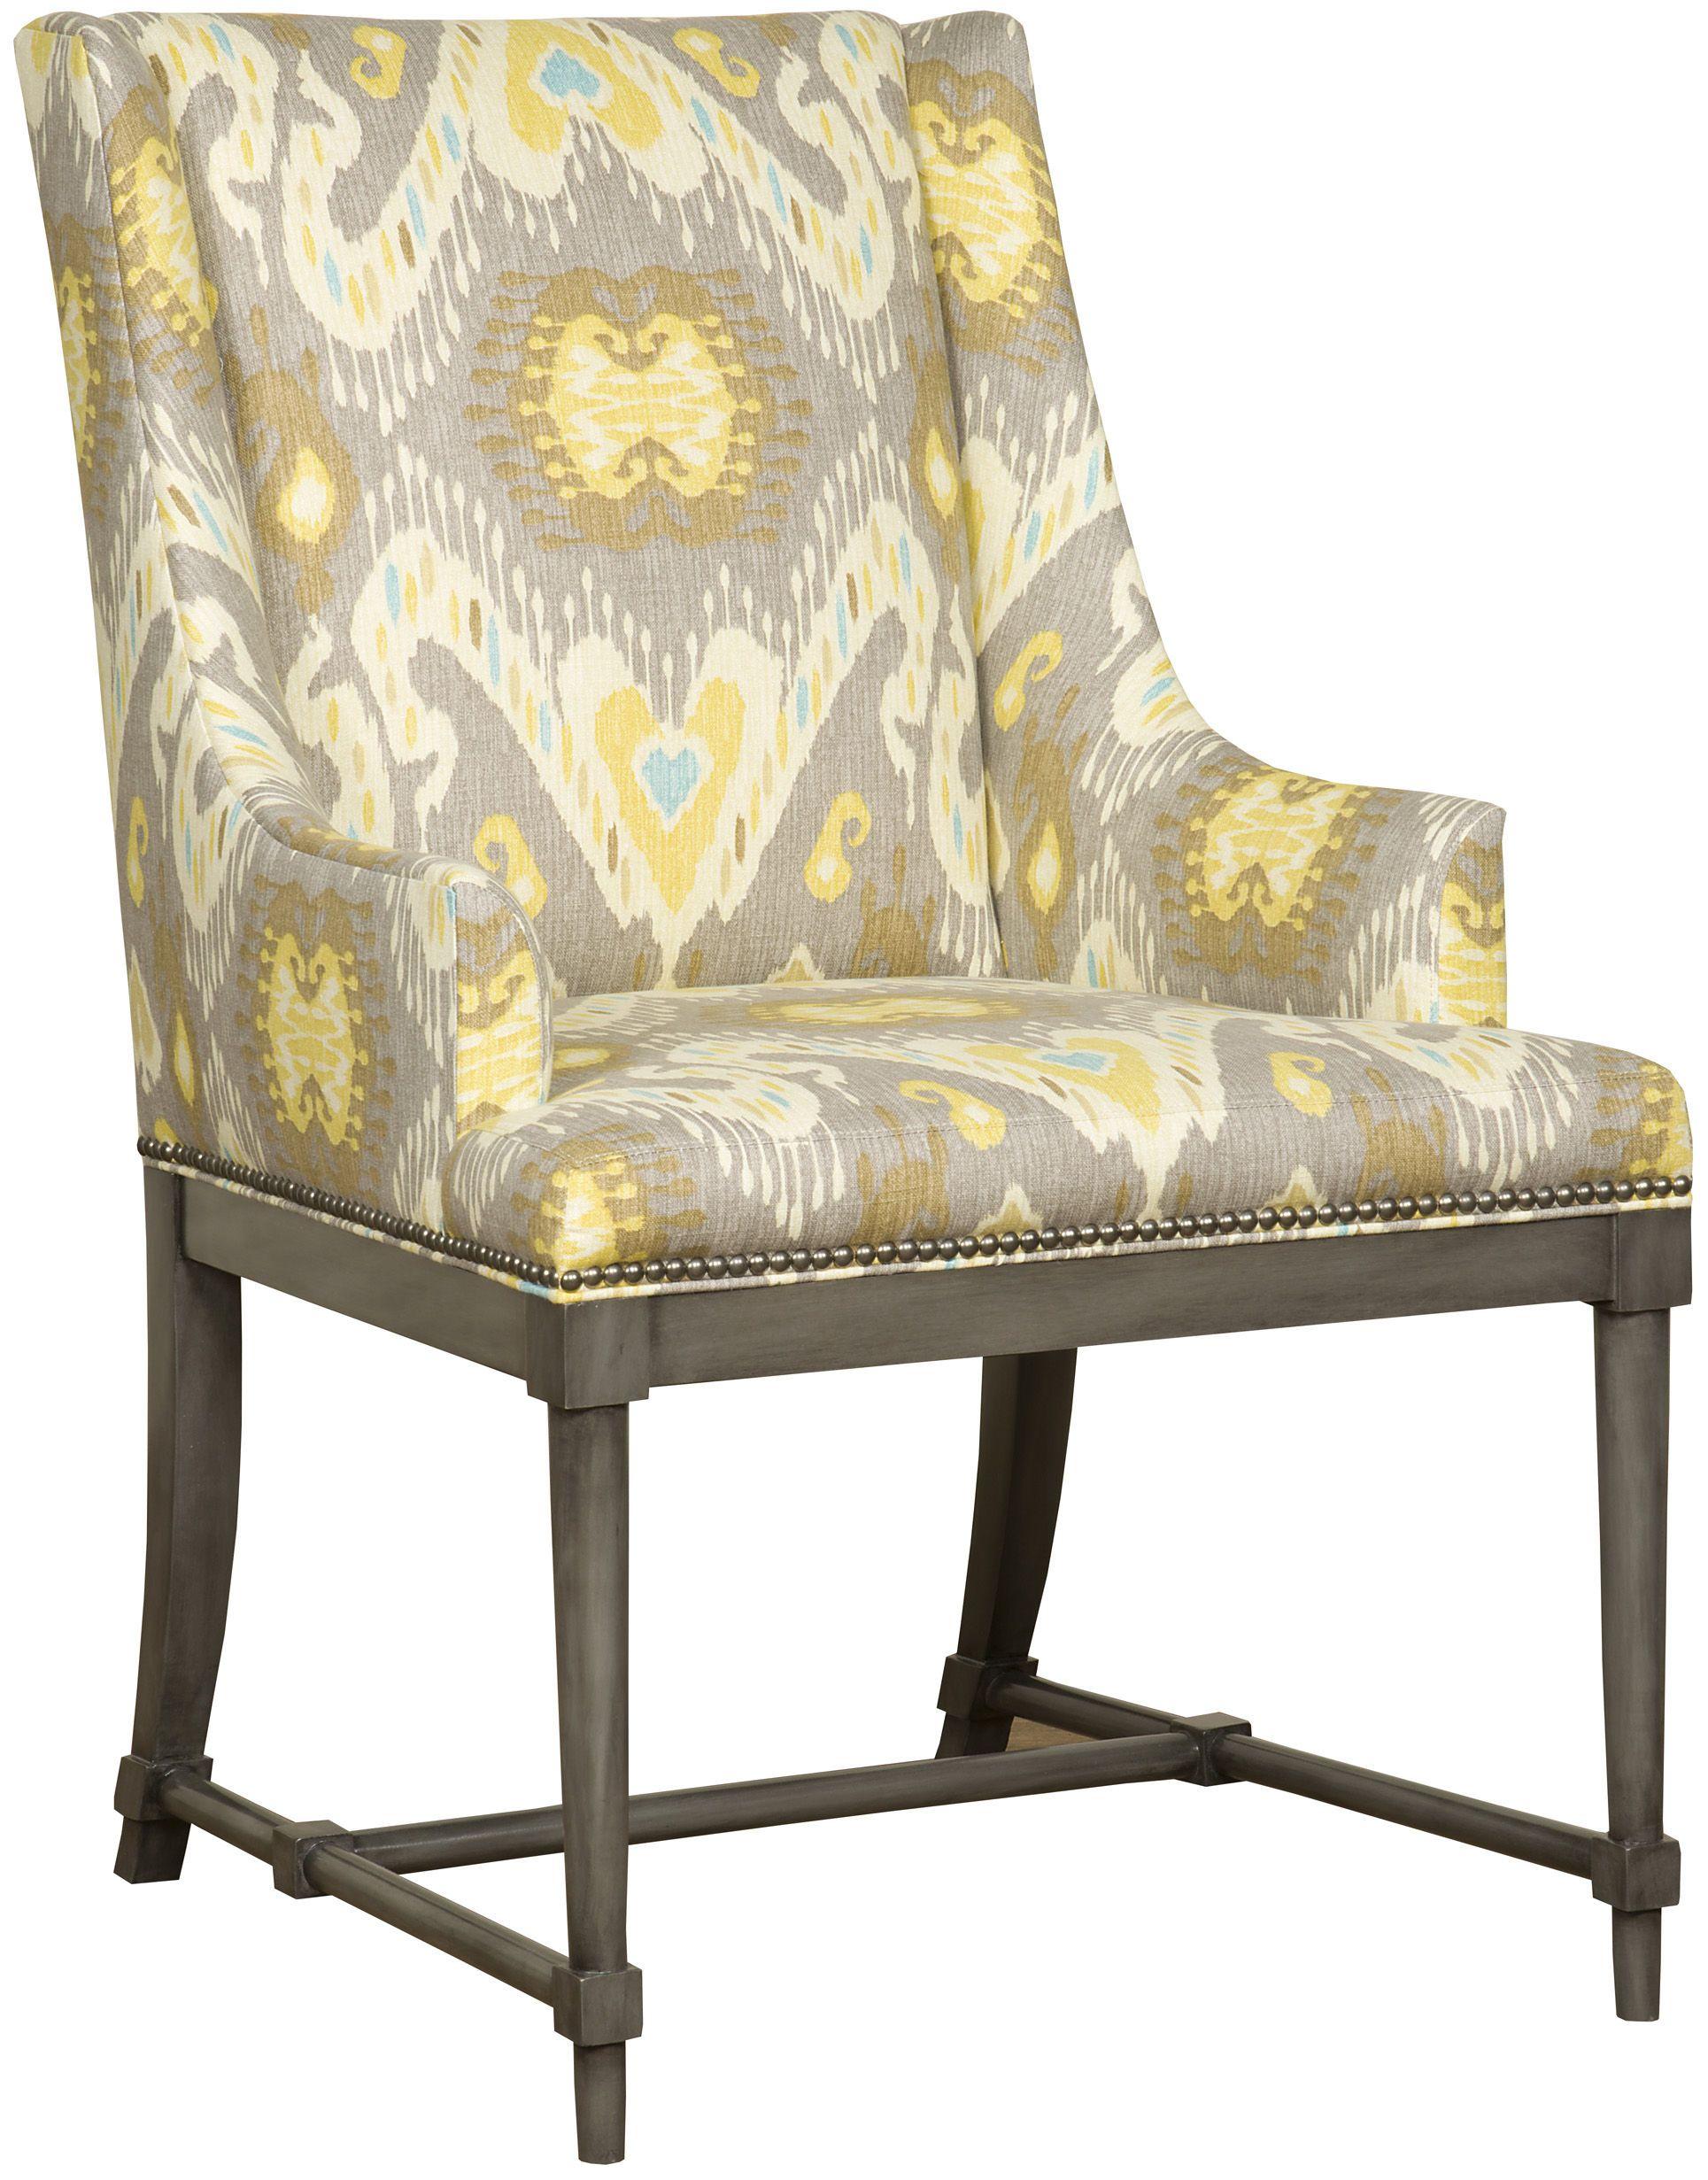 Vanguard Dining Room Arm Chair V320A   Vanguard Furniture   Conover, NC